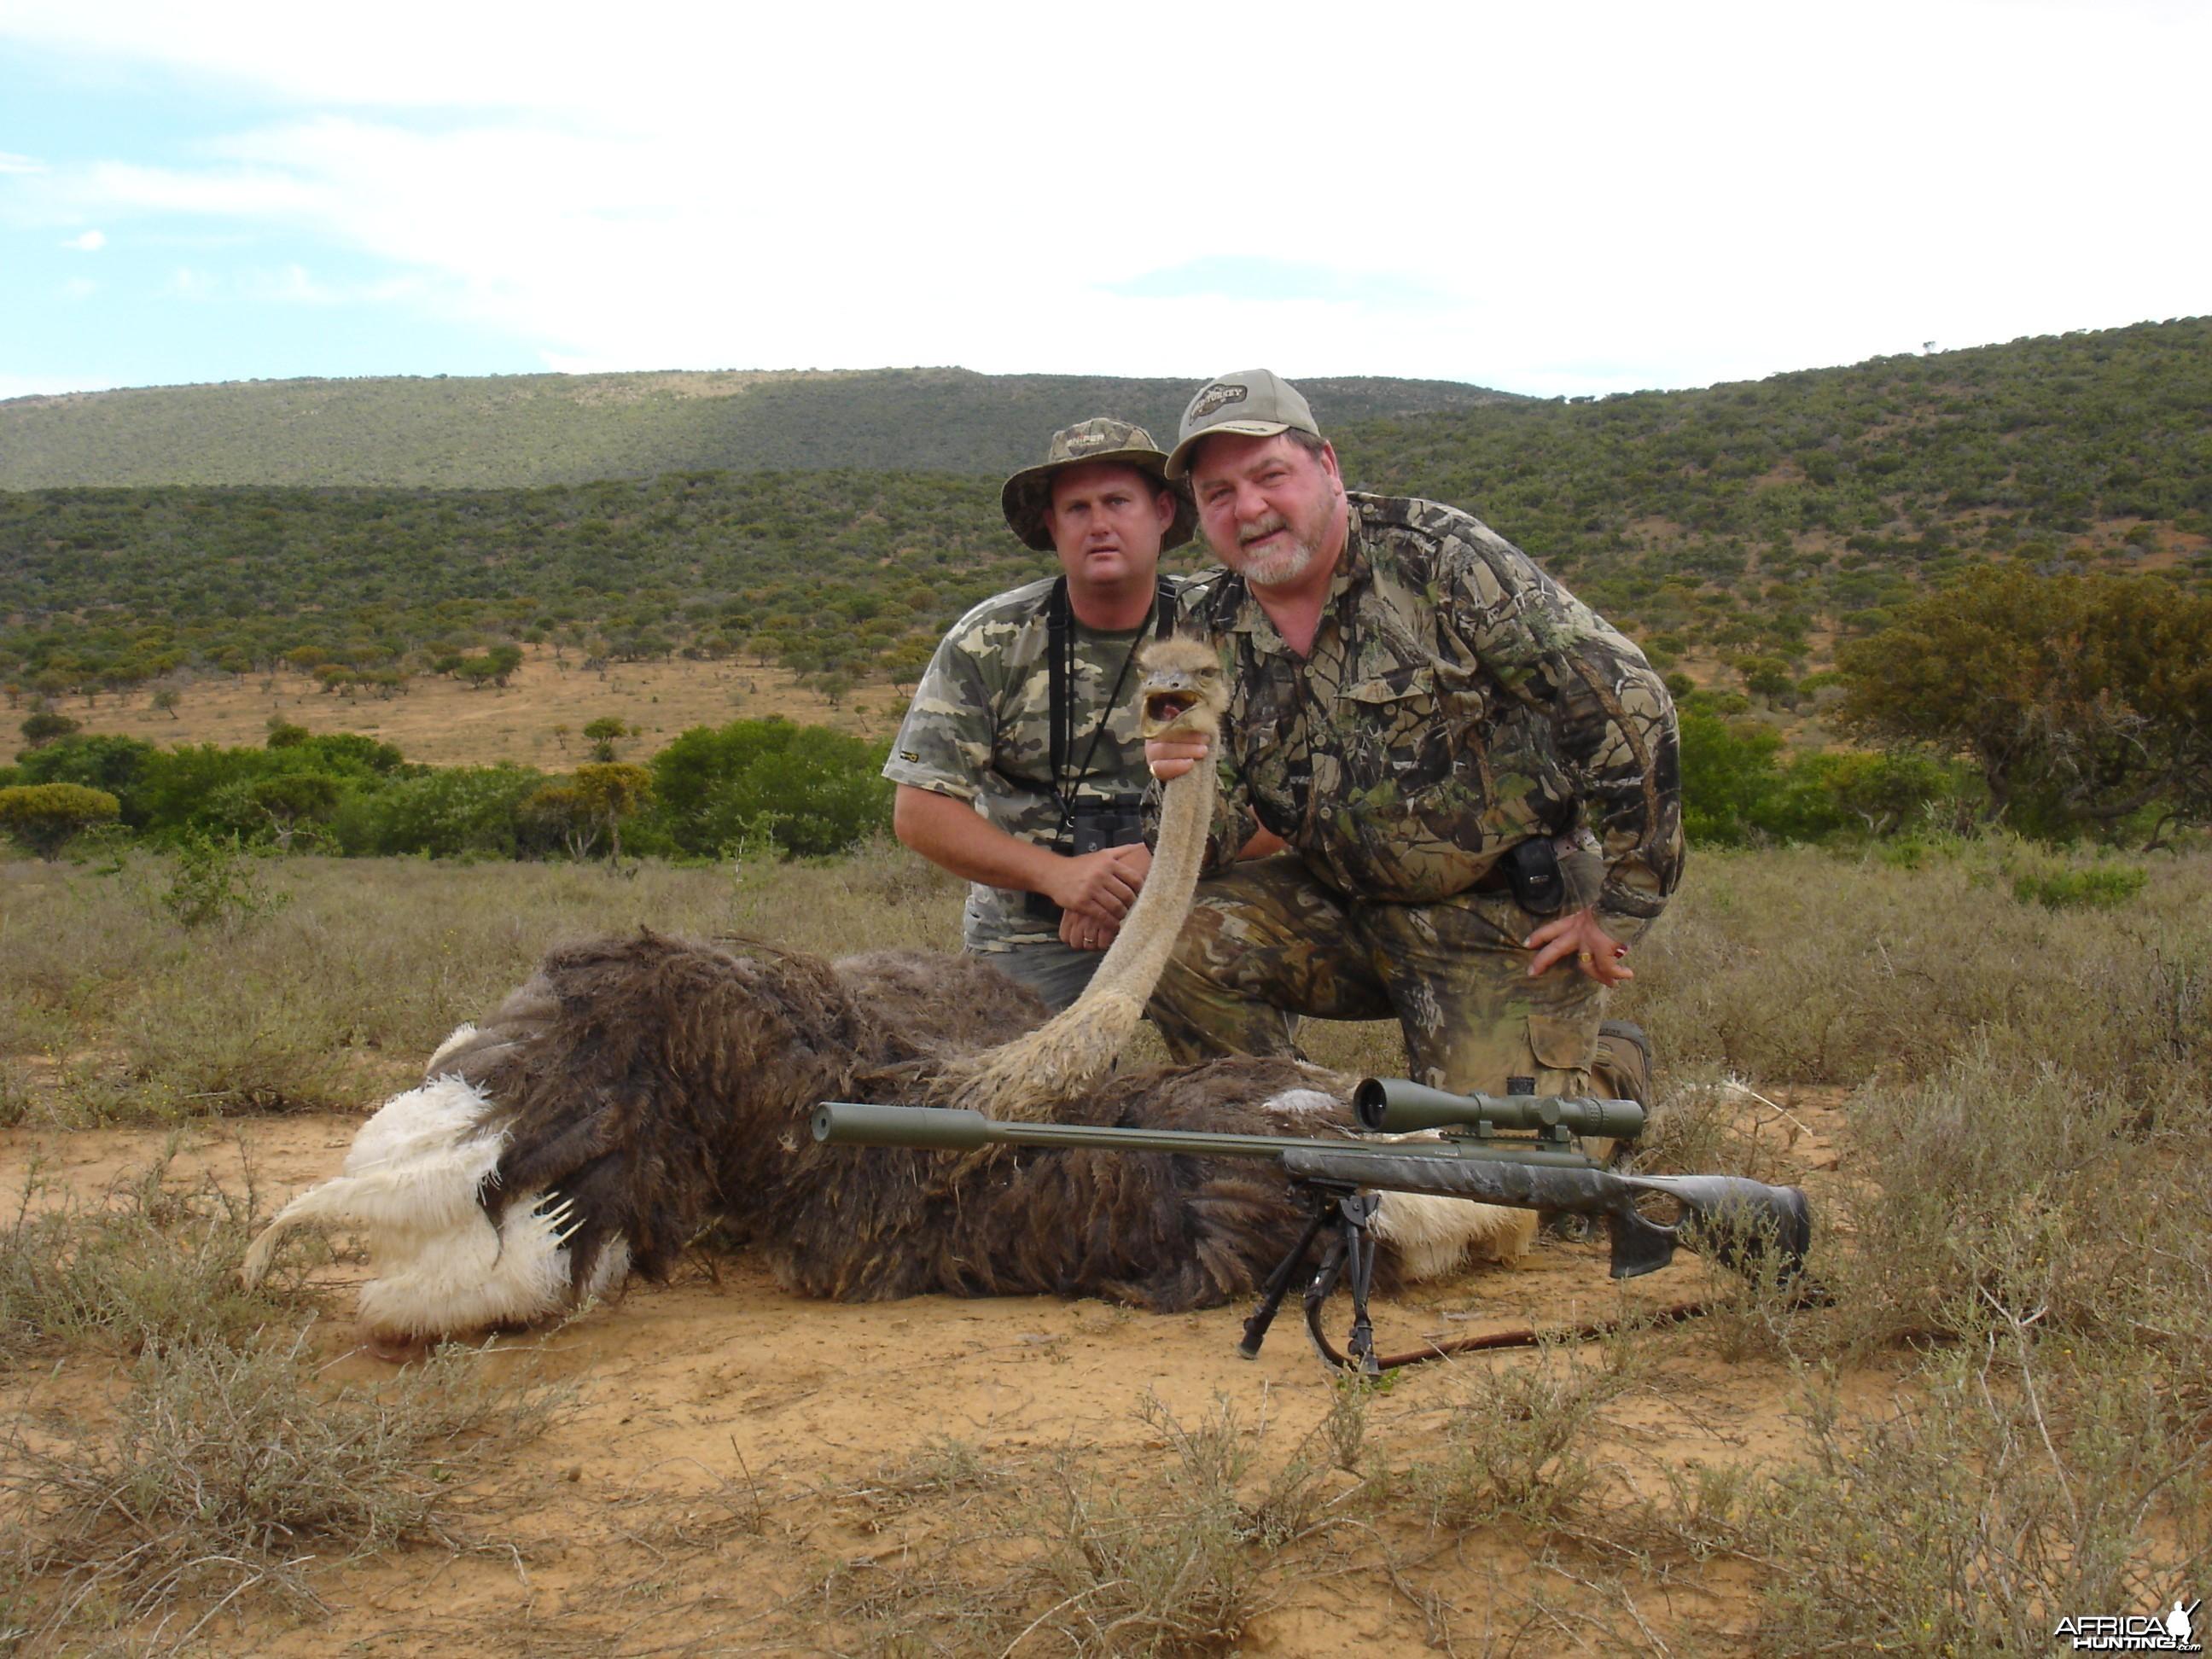 Ostrich Self and Gavin